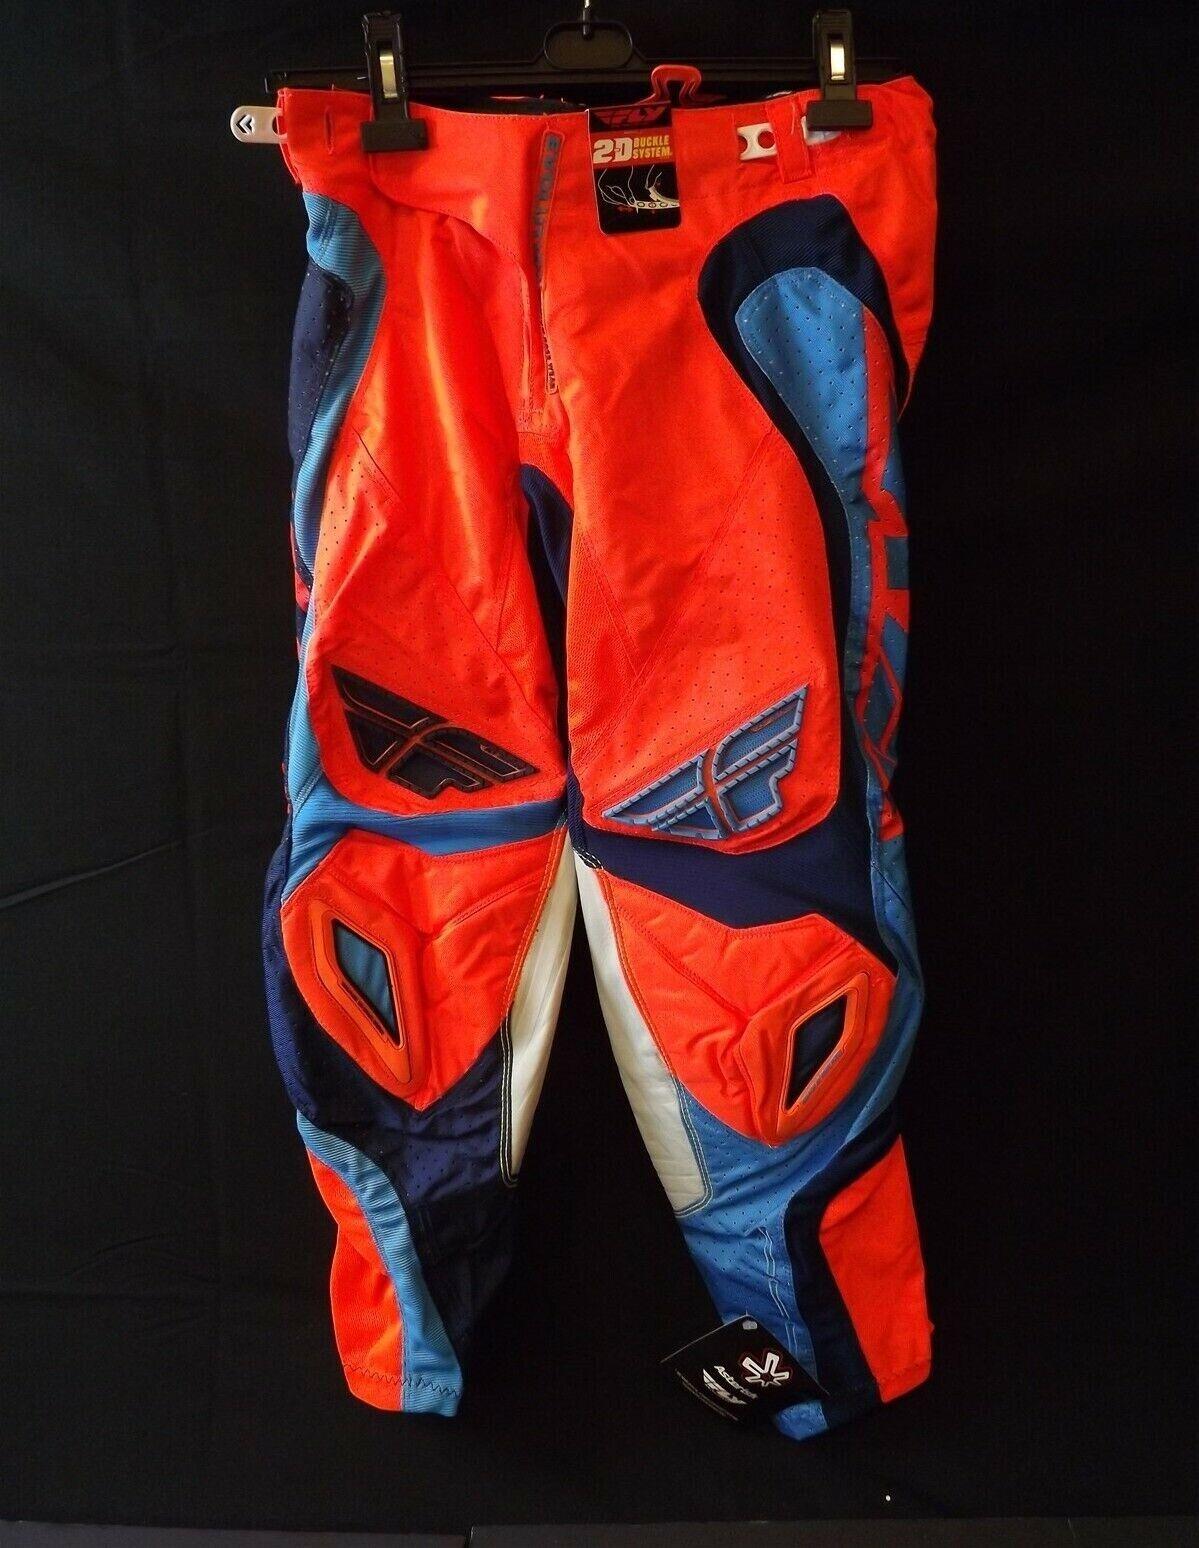 NEW FLY RACING EVOLUTION Motocross BMX Race Pants orange &  bluee MEN'S Size 28  the latest models